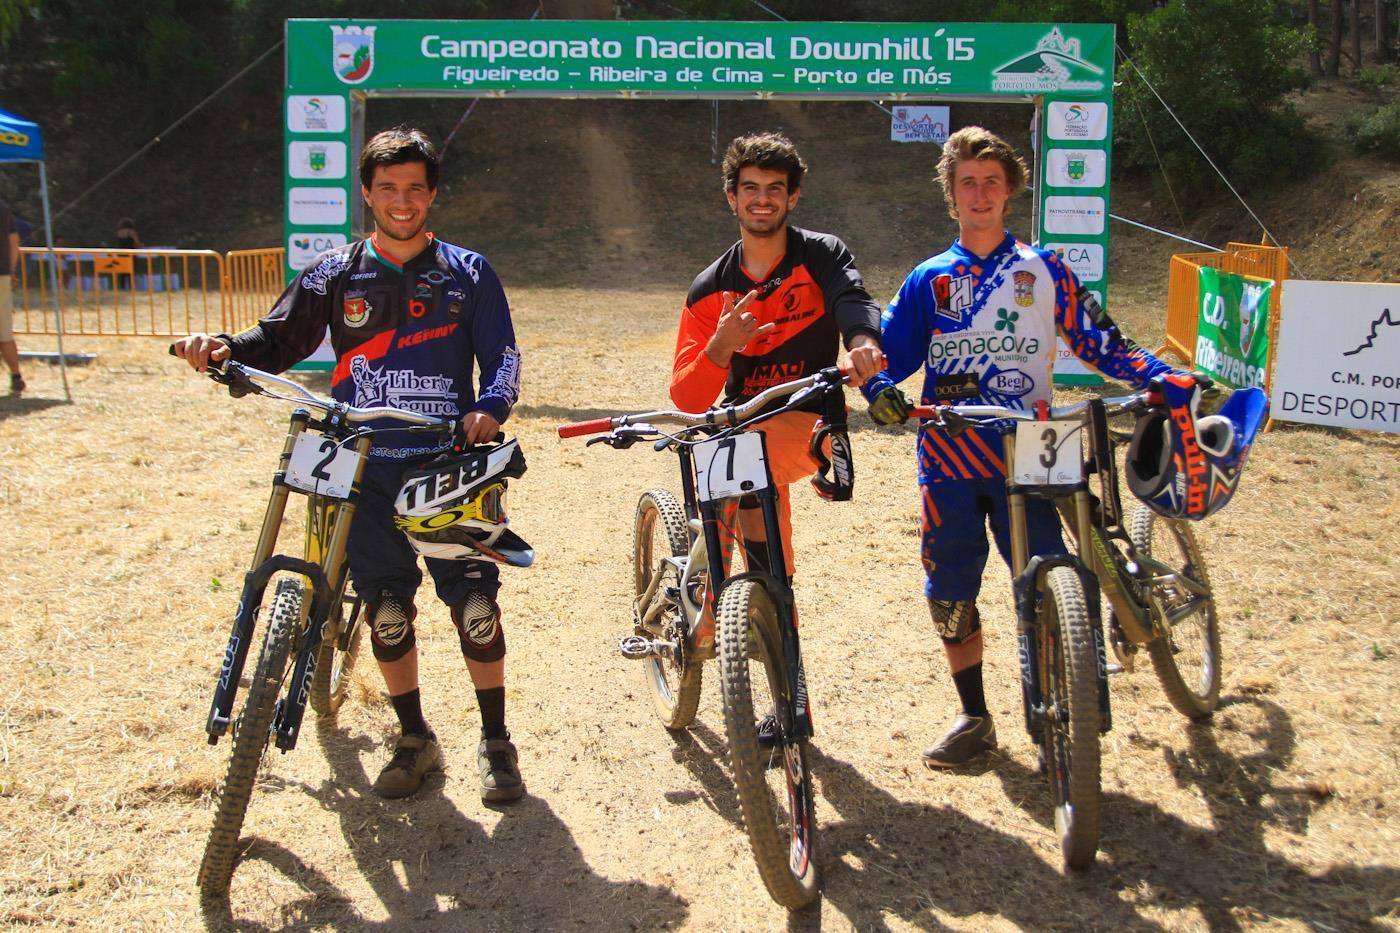 Campeonato Nacional DHI 2015 top 3